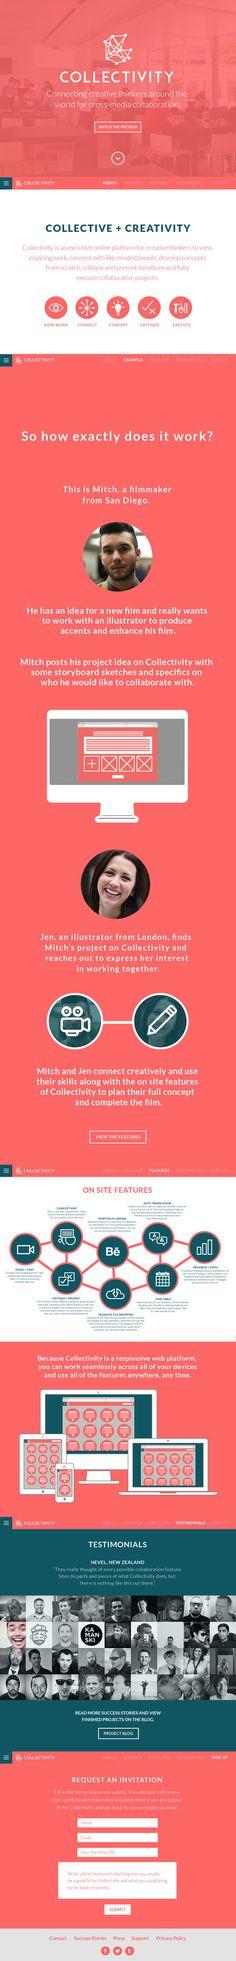 Collectivity Collaborative Web App Concept on Behance